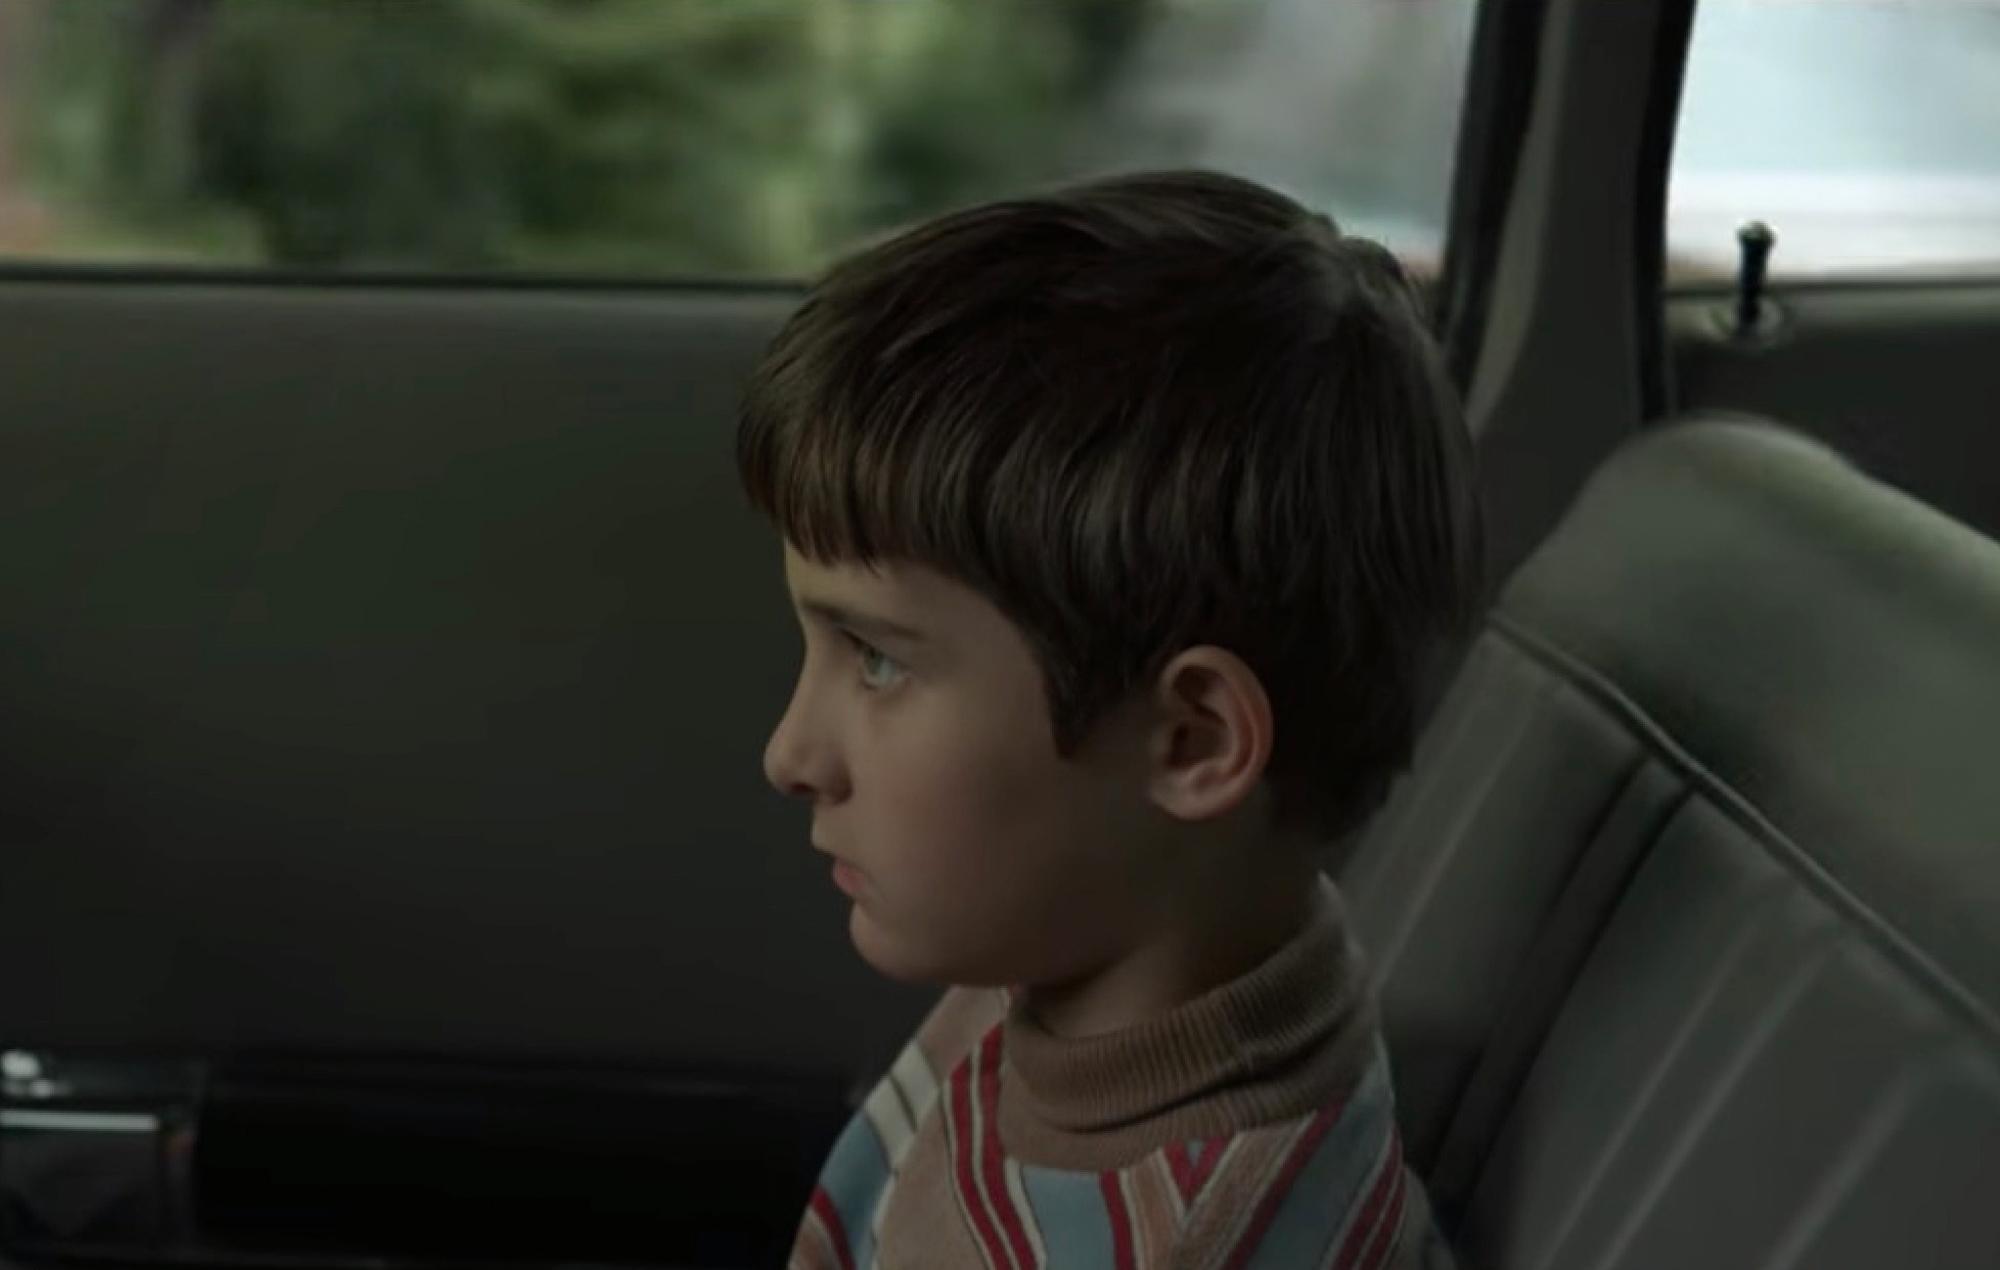 Mindhunter season 2 episode 8 Brian Tench Bill Tench son